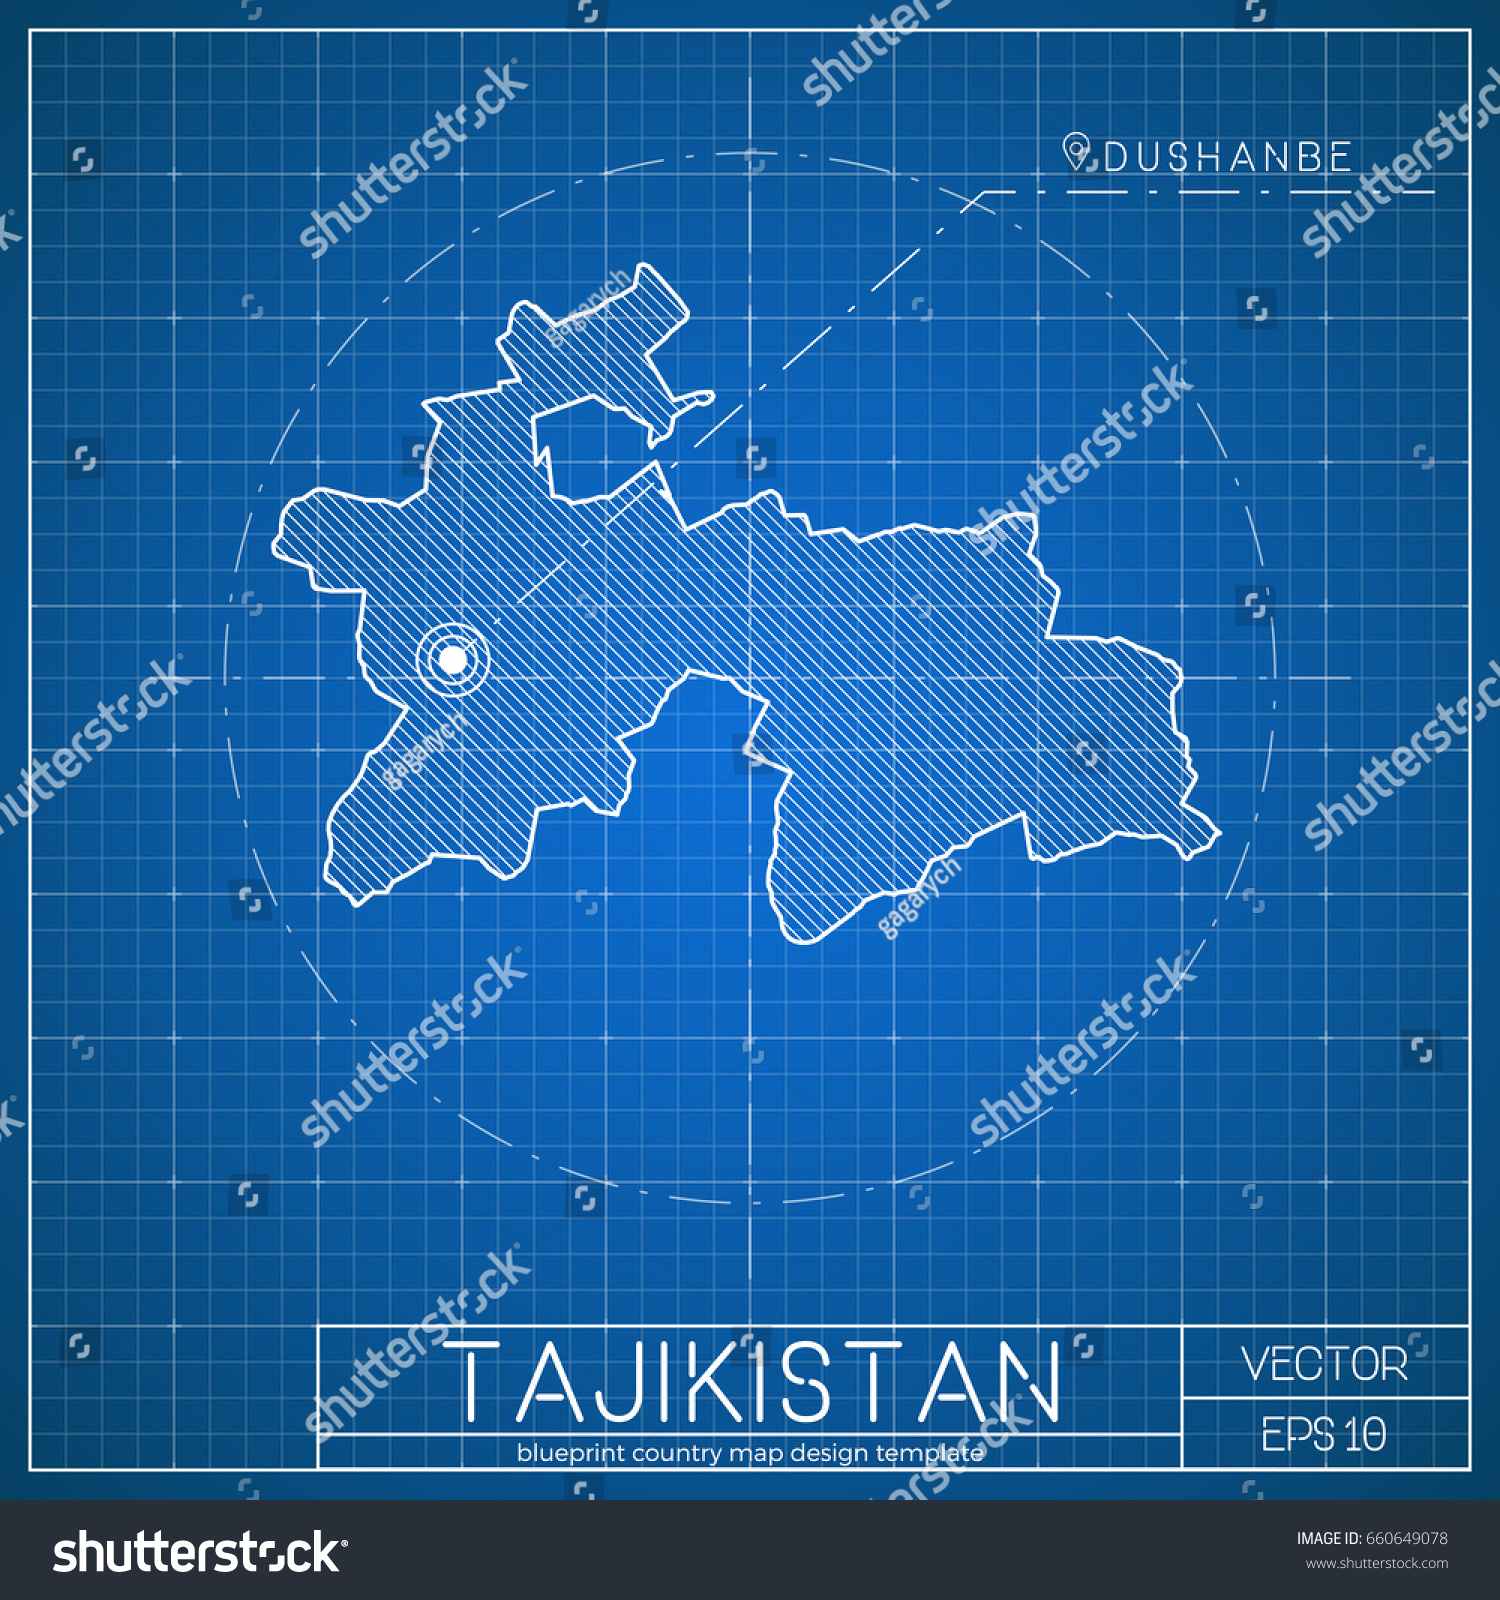 Tajikistan Blueprint Map Template Capital City Stock Vector - Tajikistan map vector